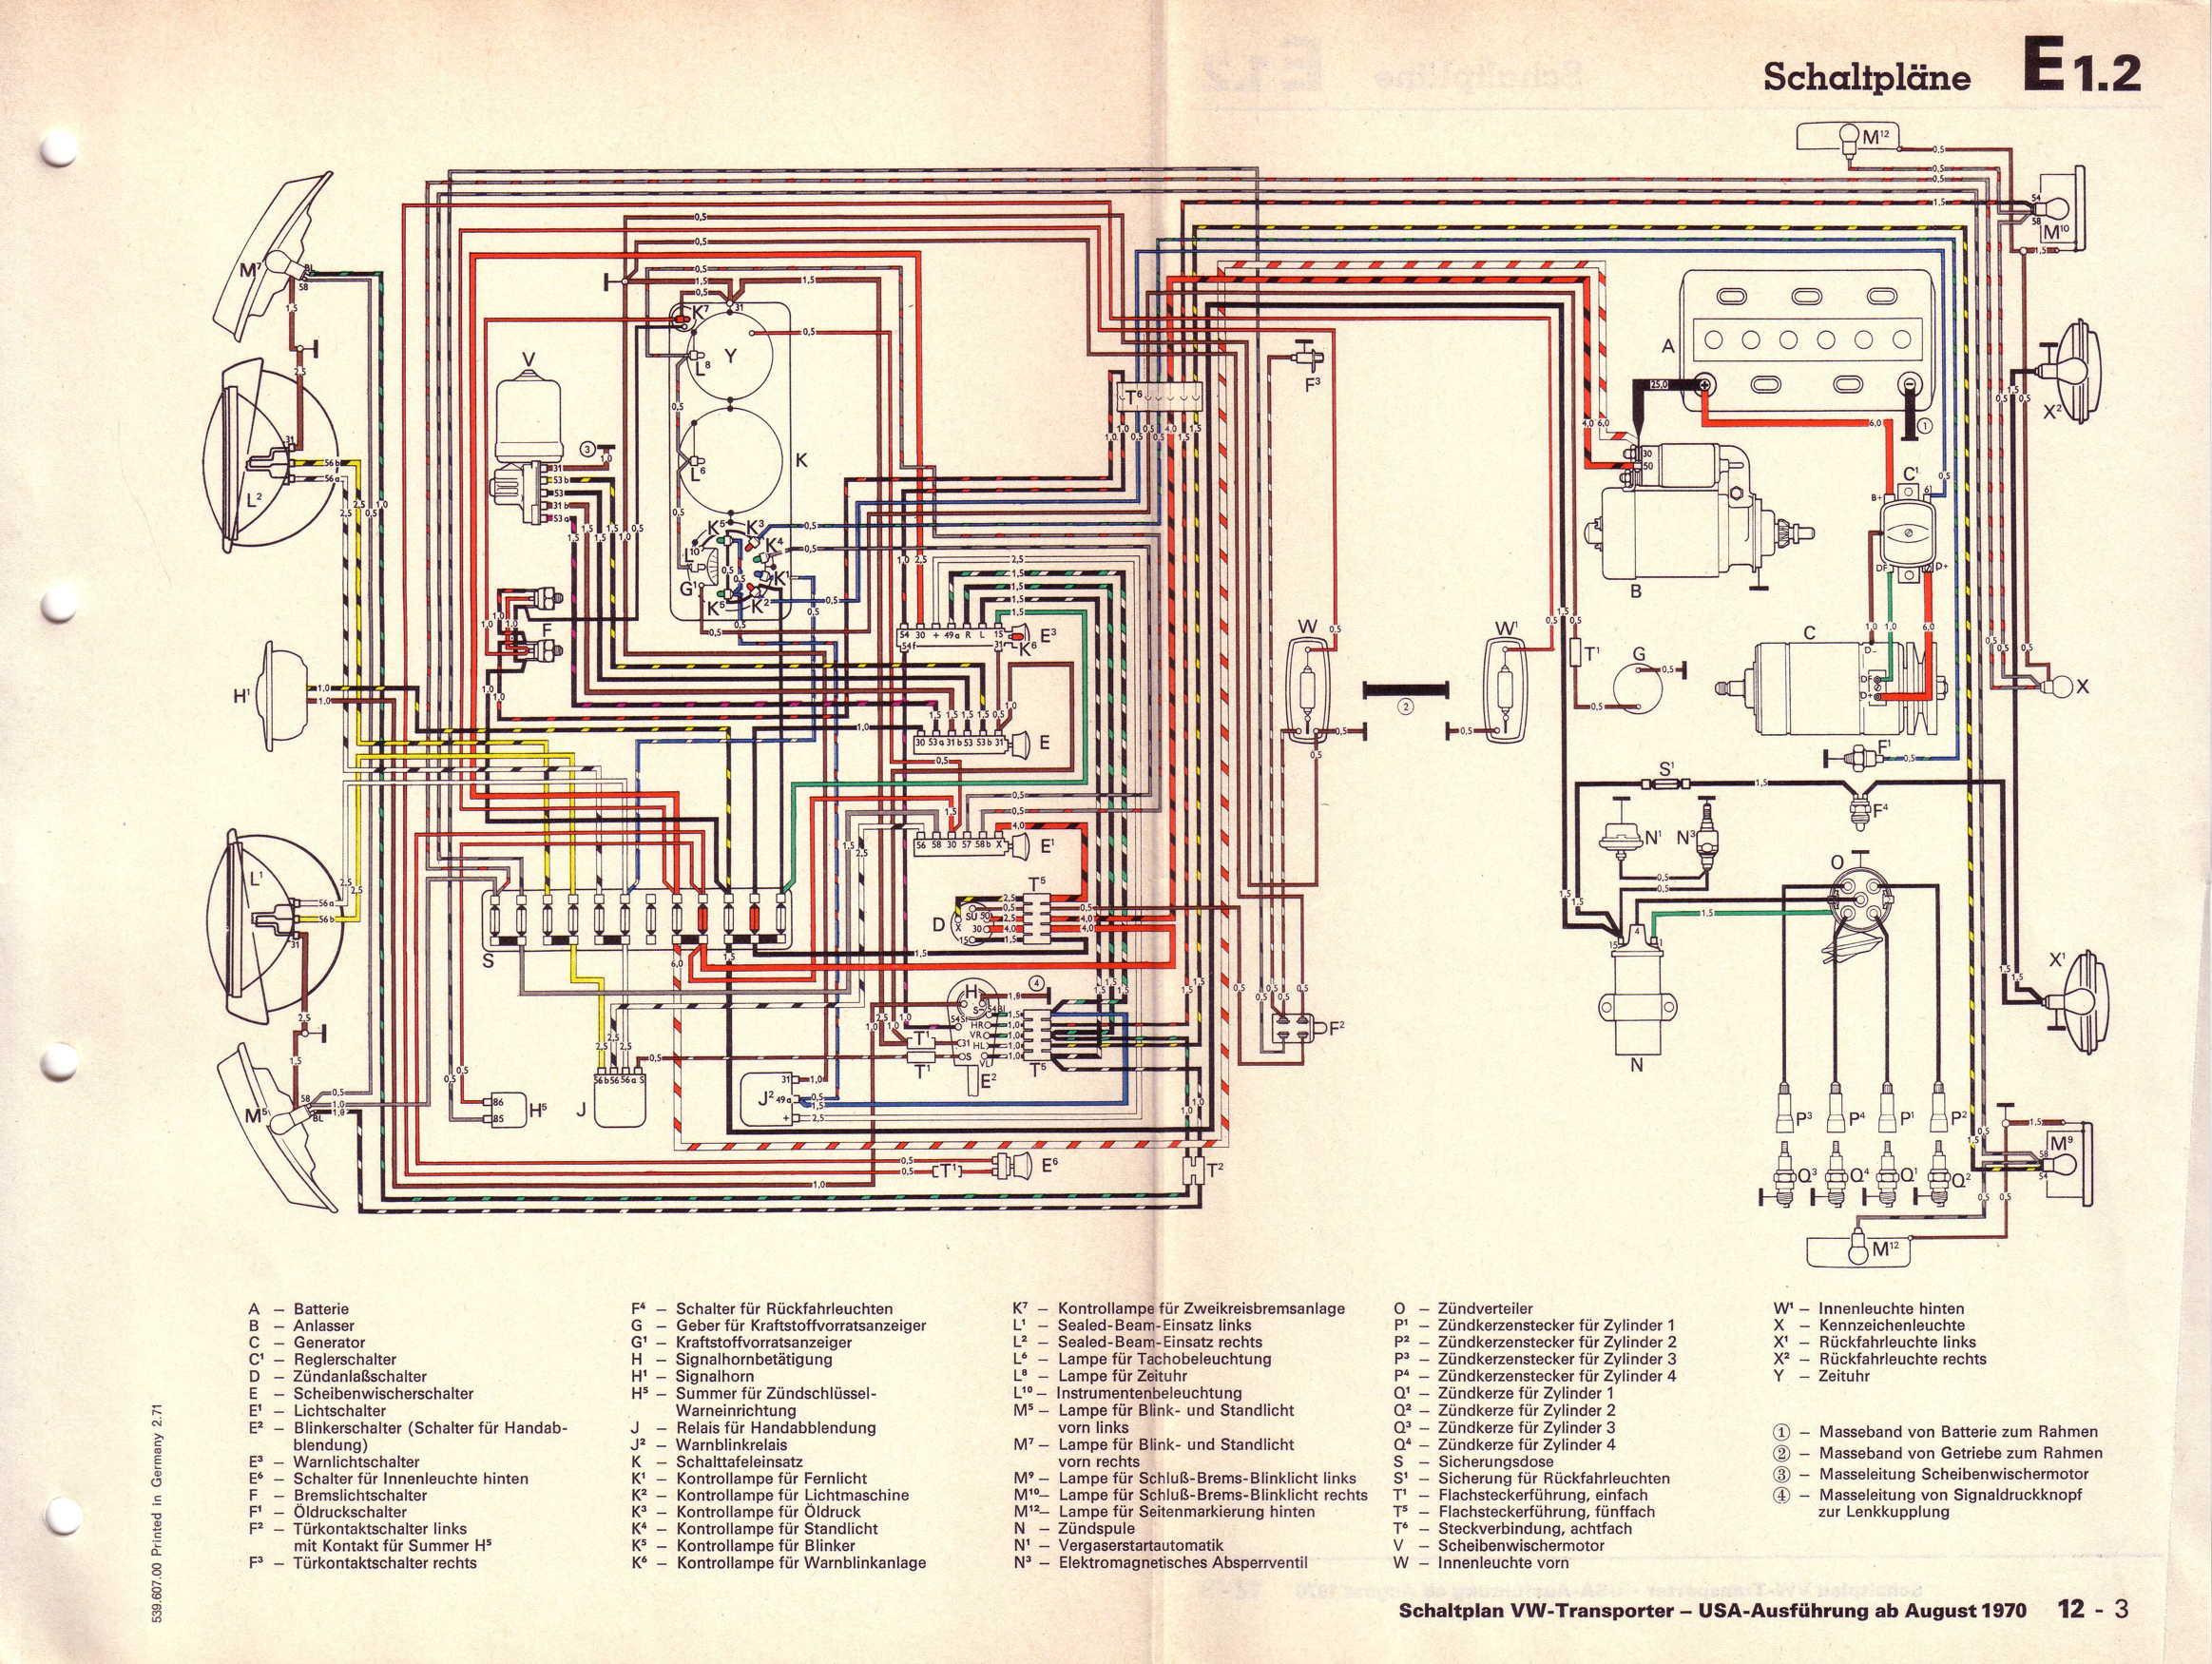 1971 Vw Bus Wiring Diagram 1968 Corvette Wiring Diagram Bege Wiring Diagram